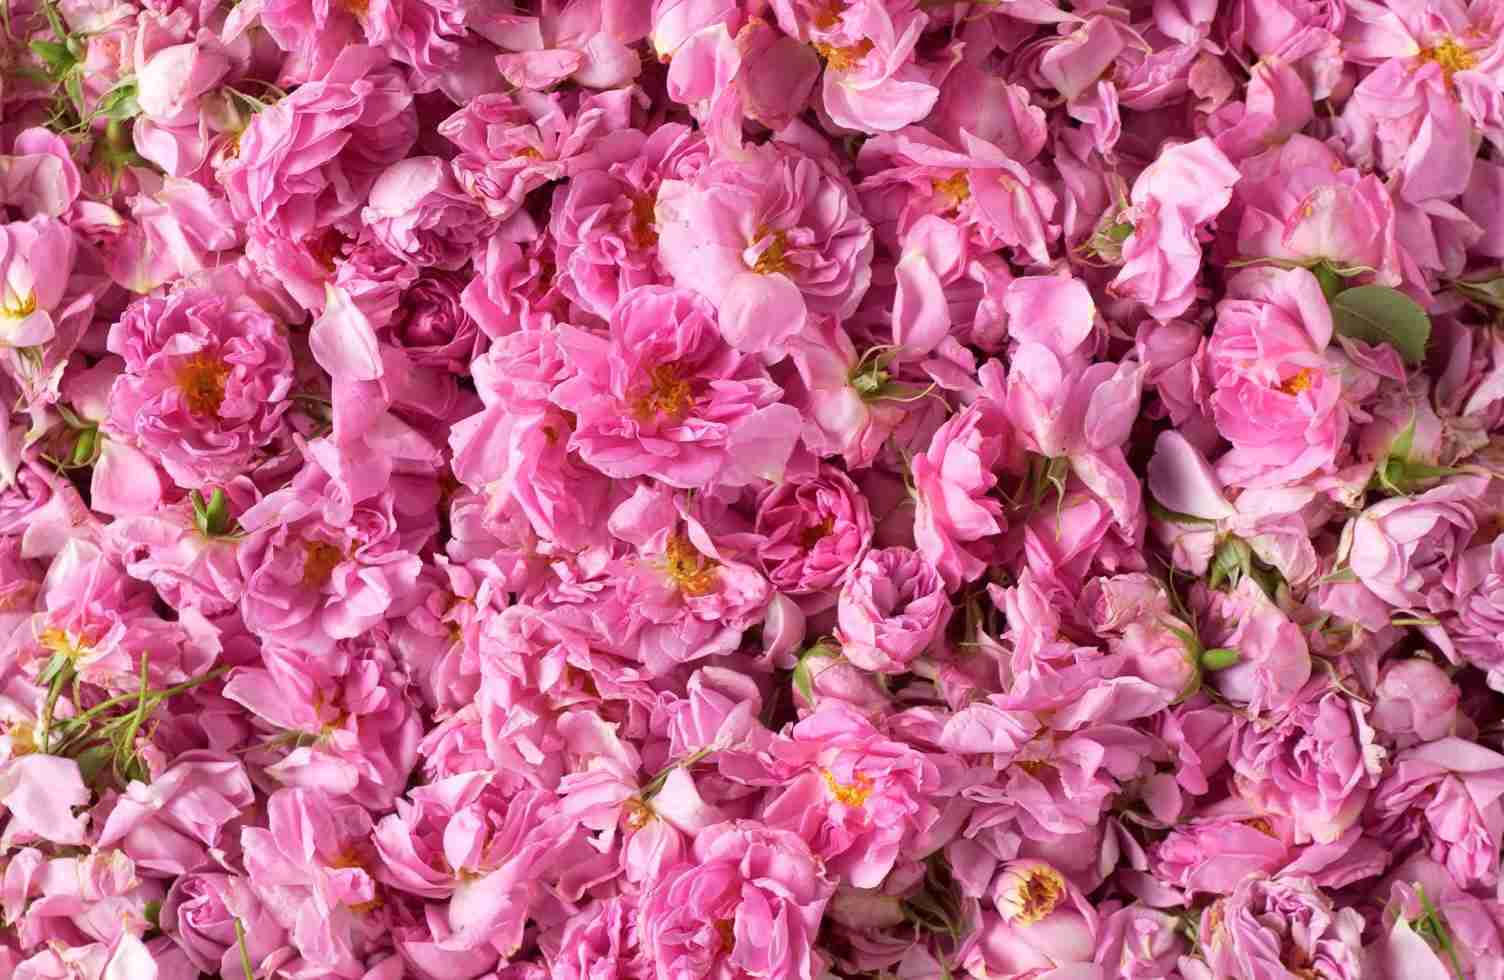 rose - photo #19